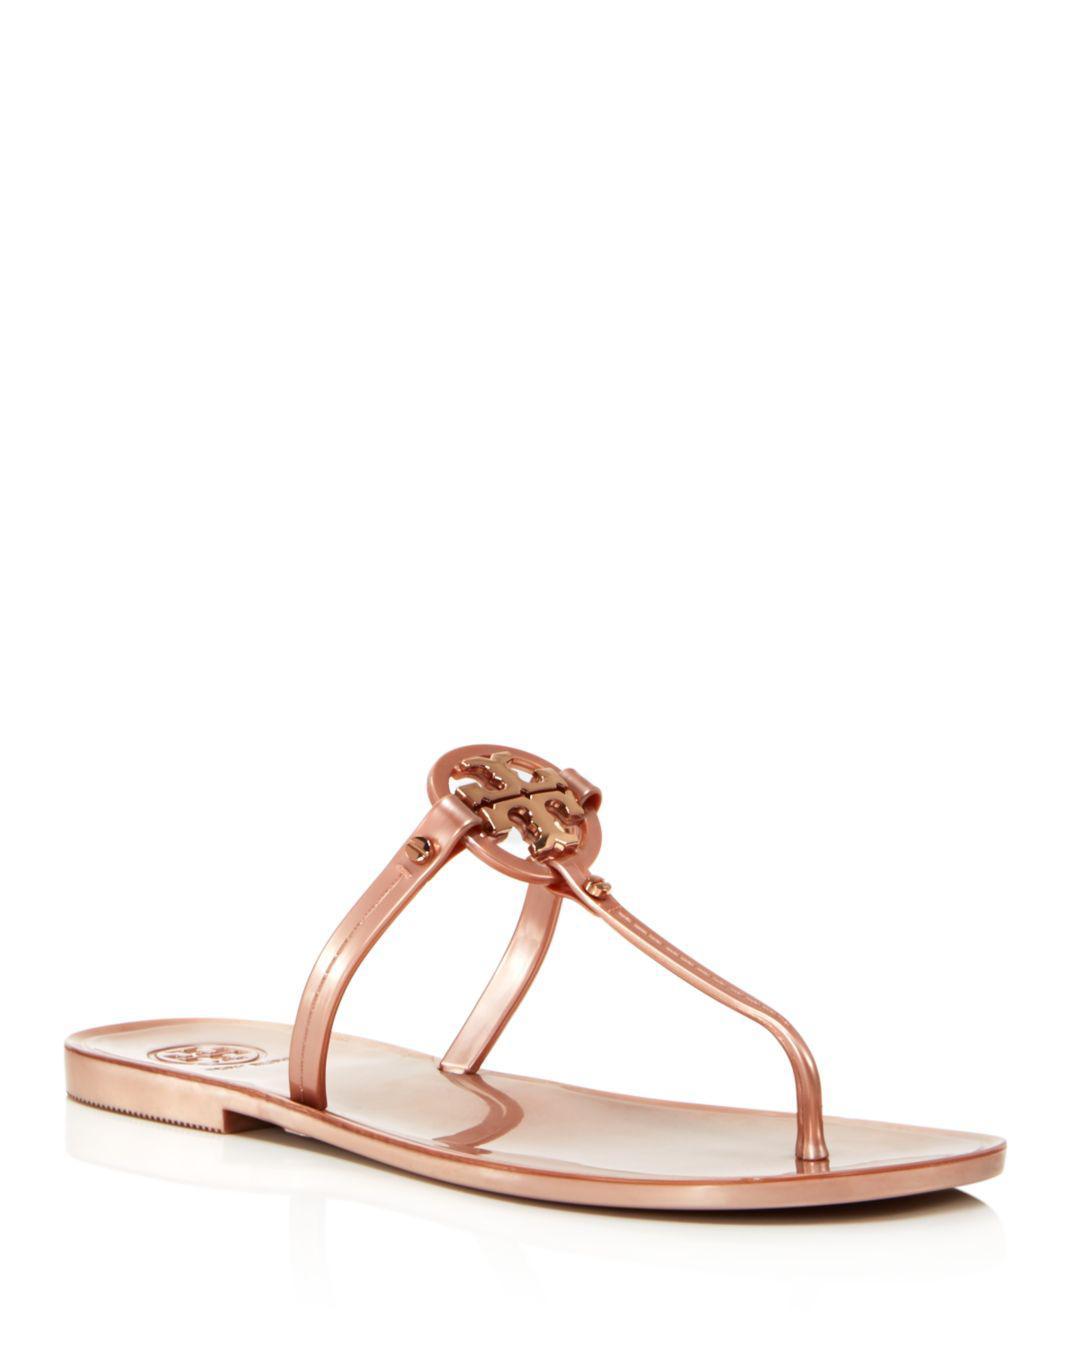 fe4efc2ae1a9c Tory Burch. Women s Mini Miller Jelly Flat Thong Sandals